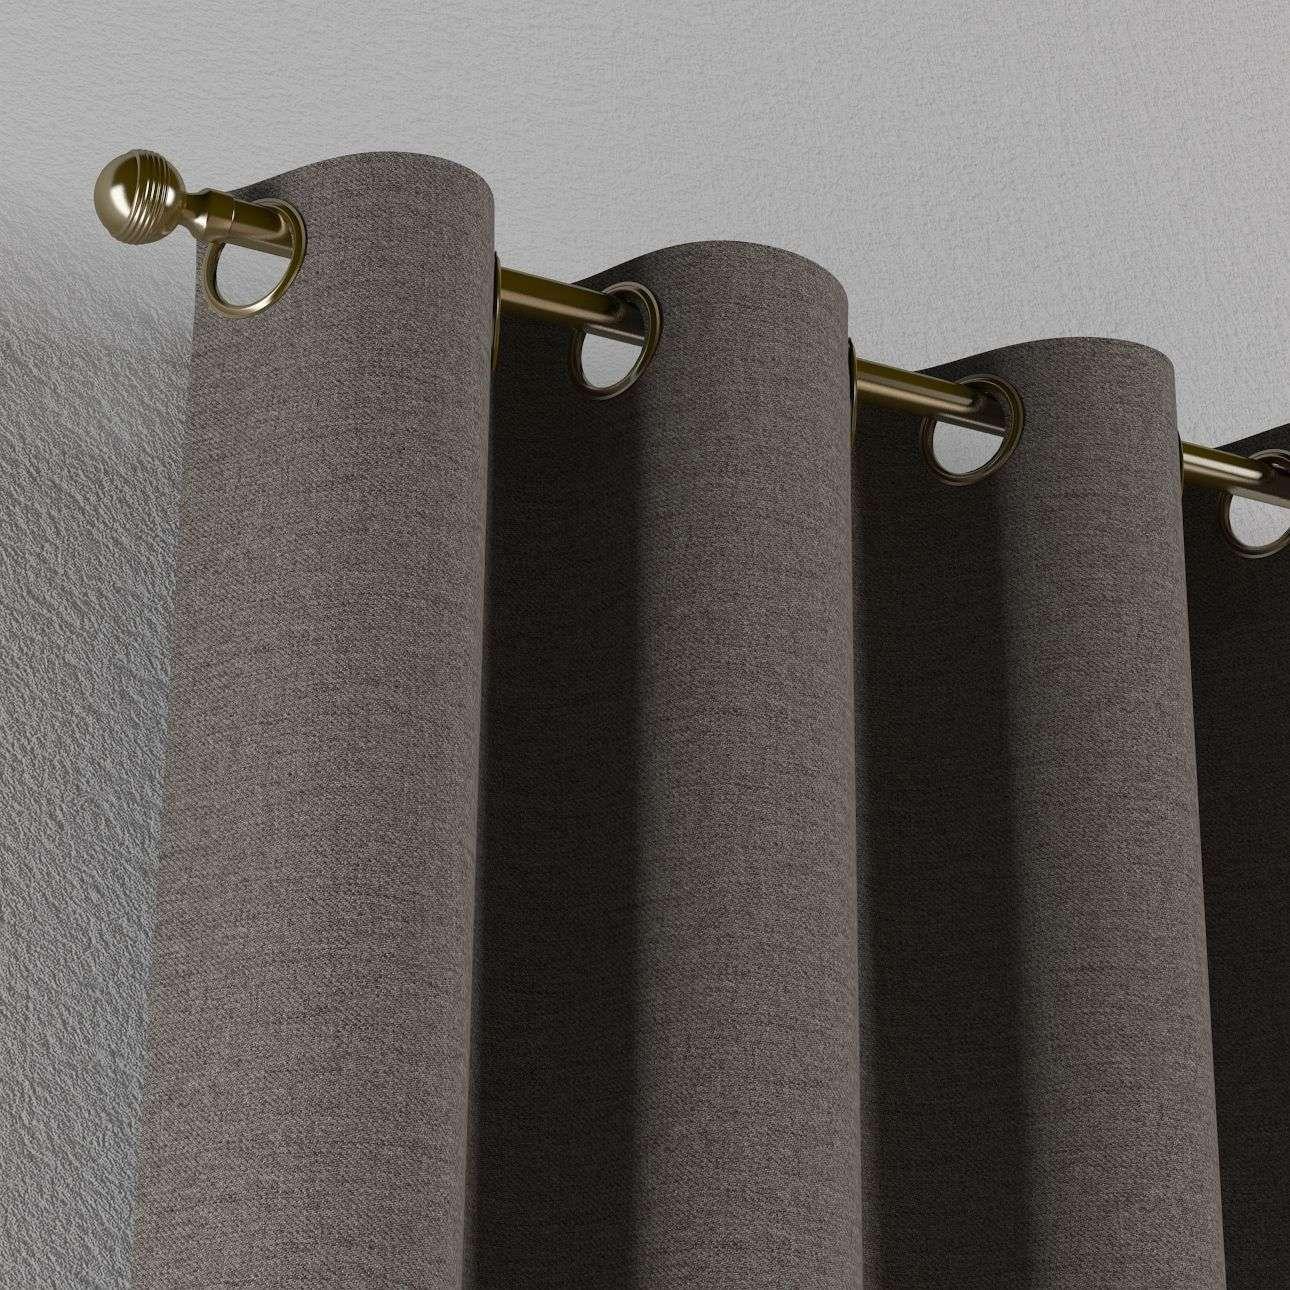 Záves s kolieskami 130 x 260 cm V kolekcii Edinburg, tkanina: 115-77